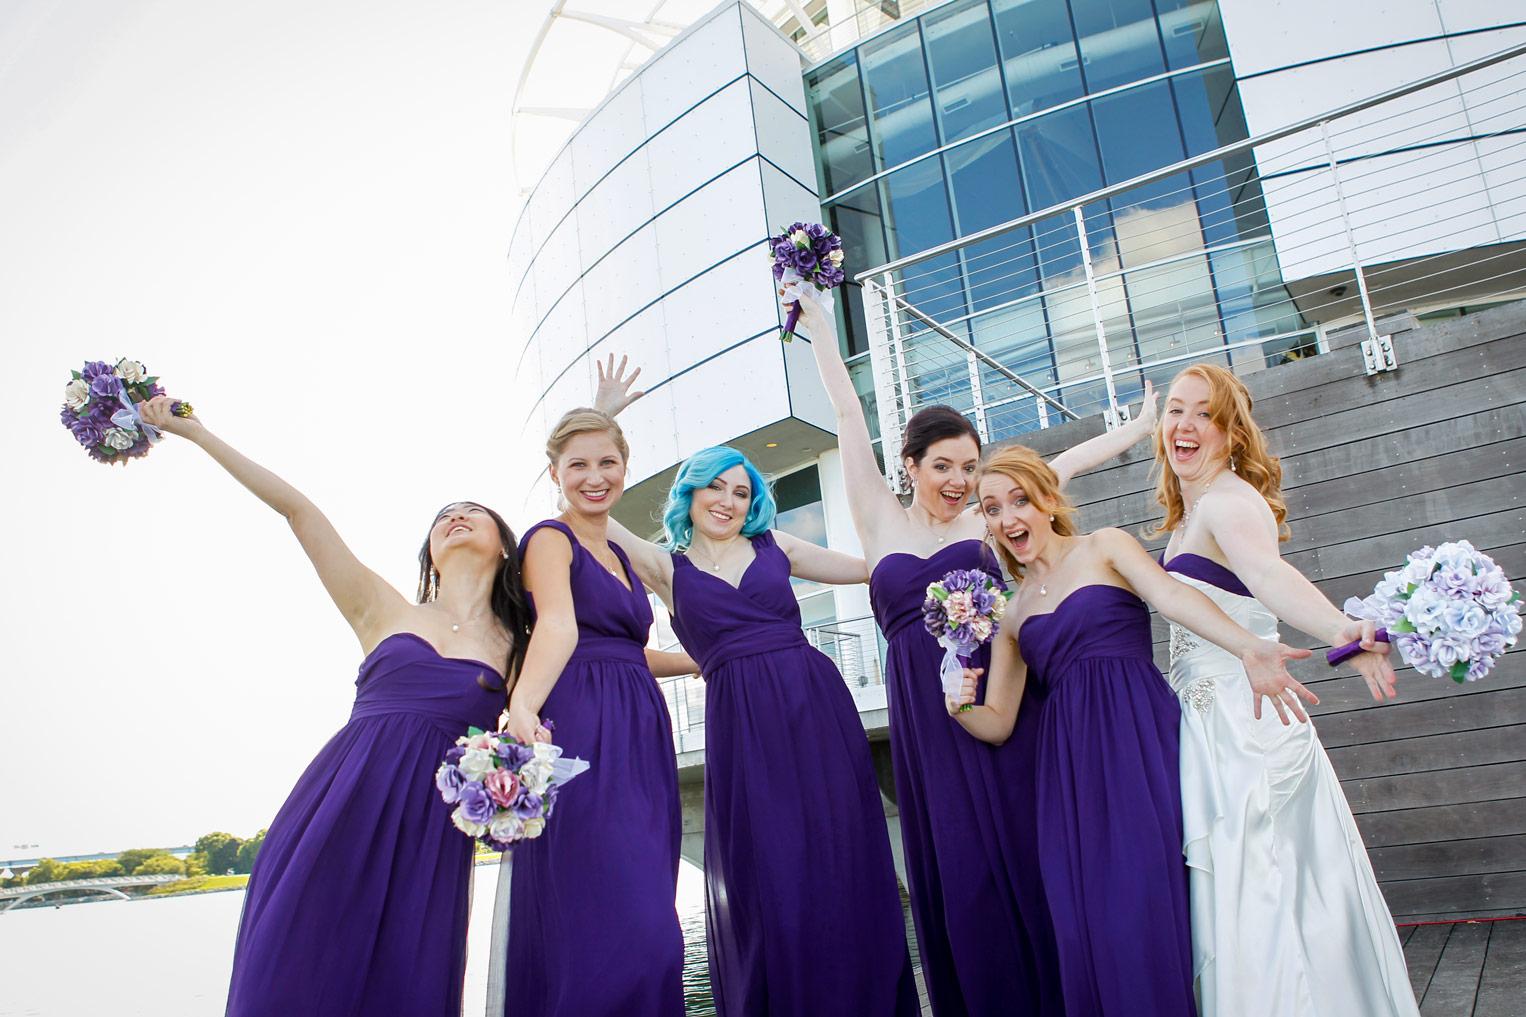 milwaukee-discovery-world-pier-wisconsin-wedding-ruthie-hauge-photography-17.jpg